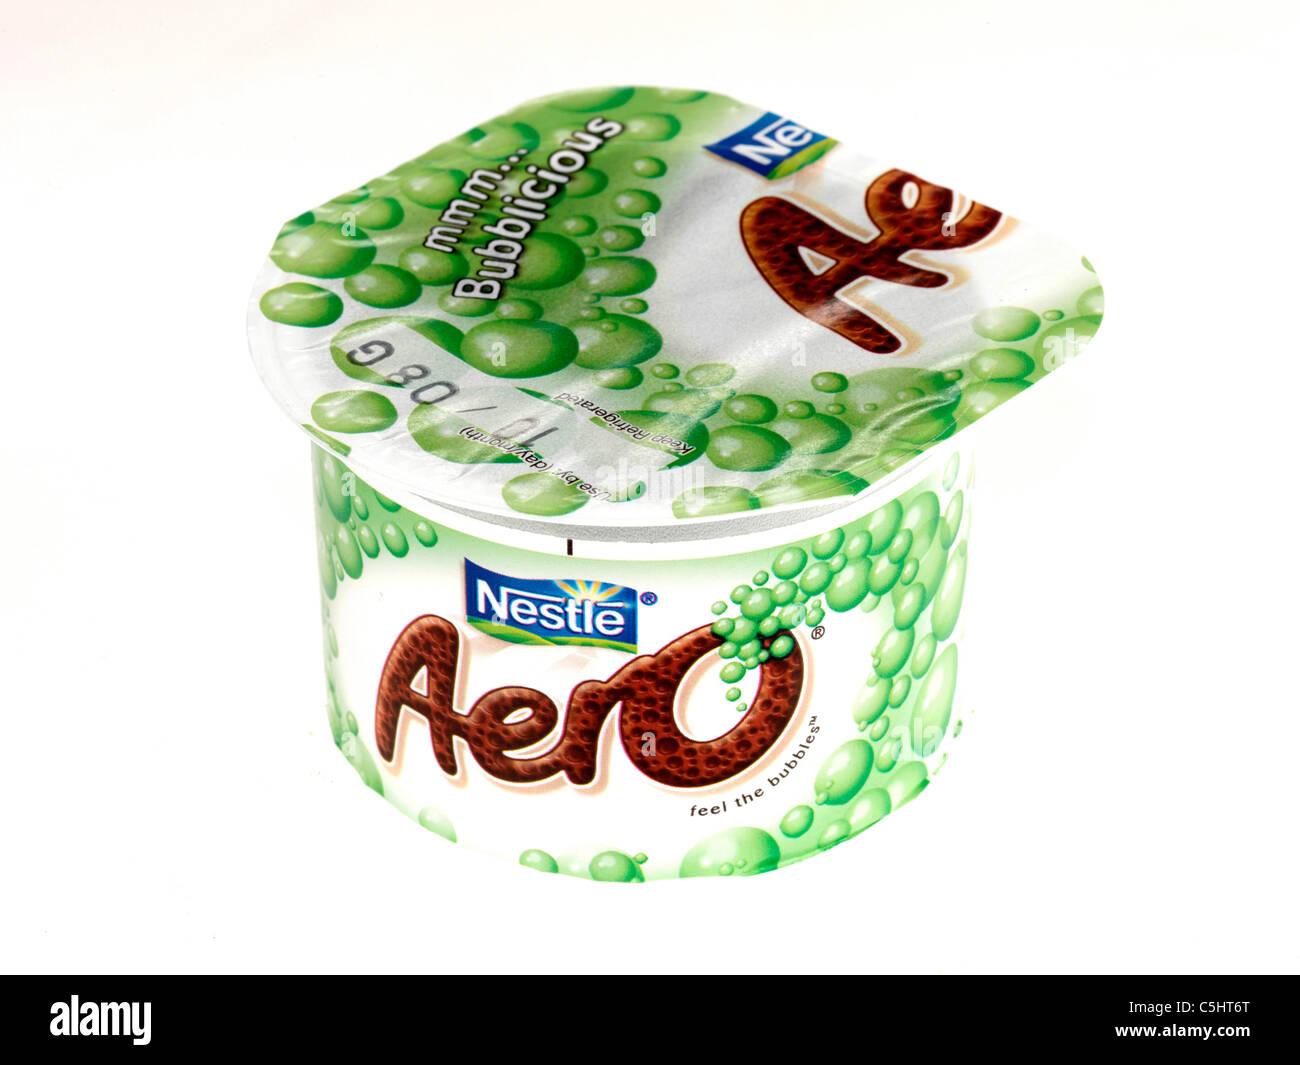 Aero Chocolate Desserts - Stock Image